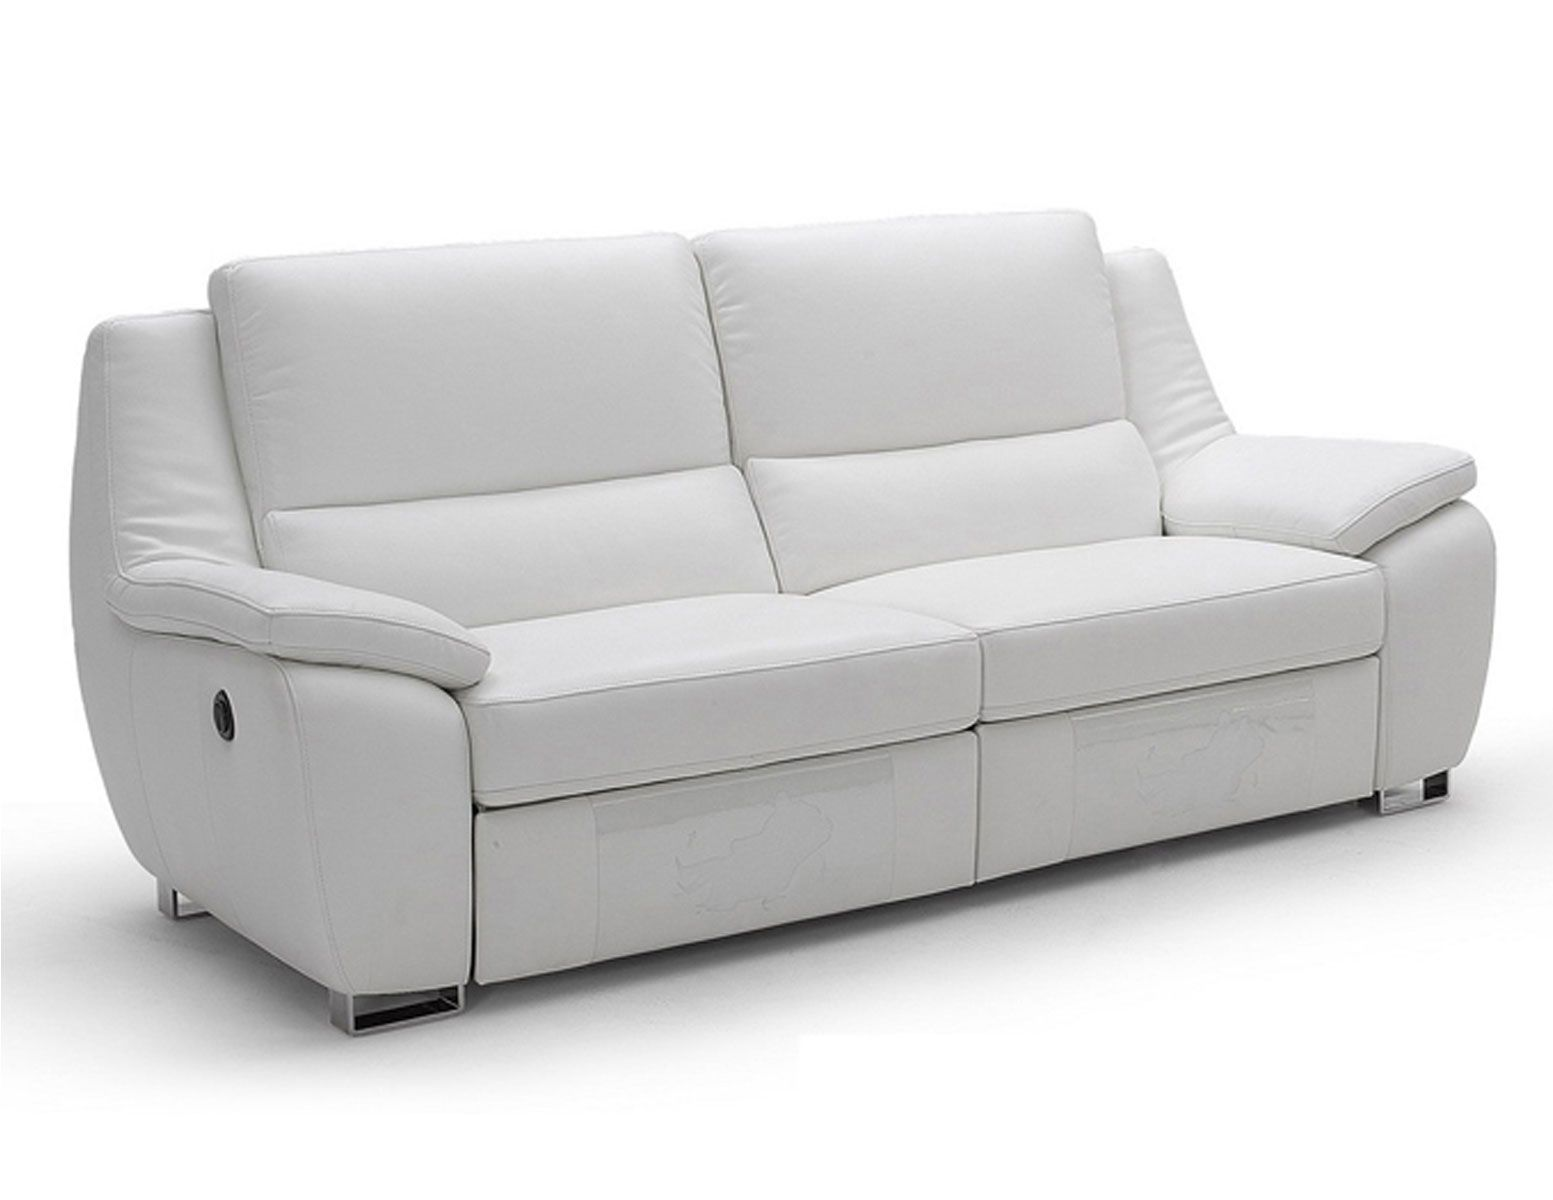 Local made sofa set tissus finish relaxon group - Sofa Condo Inclinable Lectrique En Cuir De Style Contemporain Choix De Cuirs